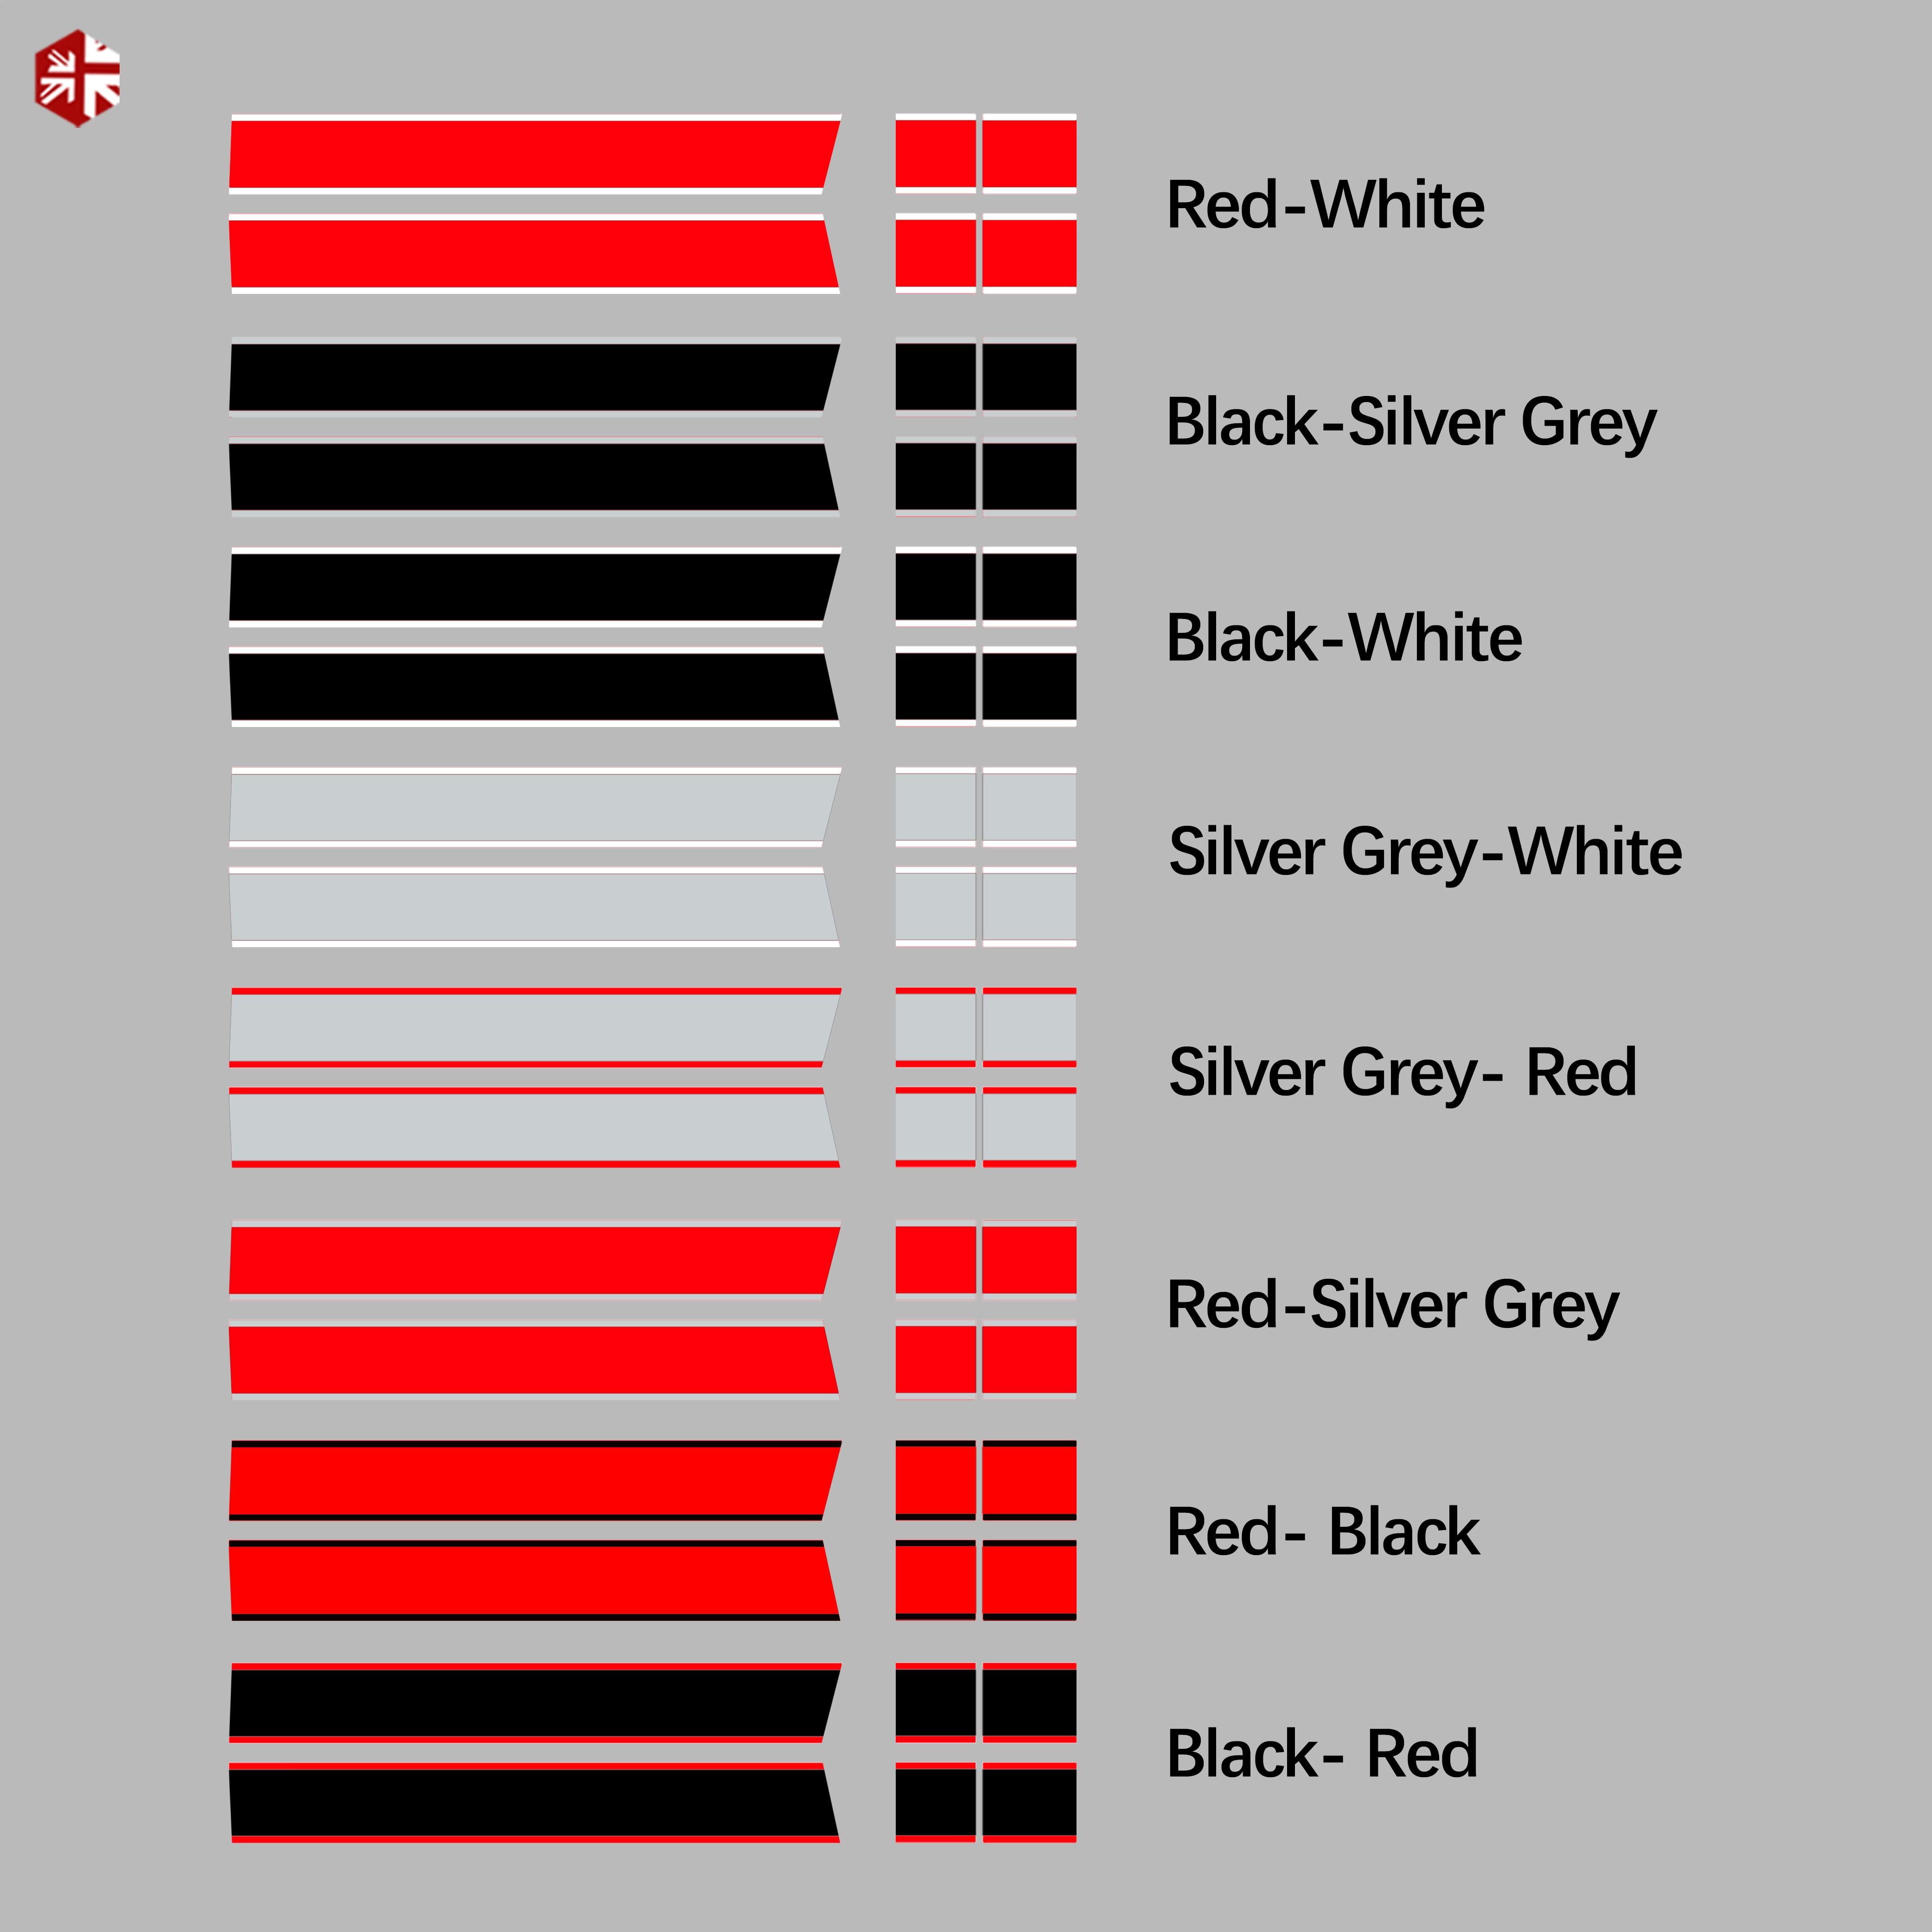 Car Hood Decal Engine Cover Rear Trunk Line Vinyl Bonnet Stripe Sticker For MINI Cooper F55 F56 F57 R56 R57 One JCW Accessories